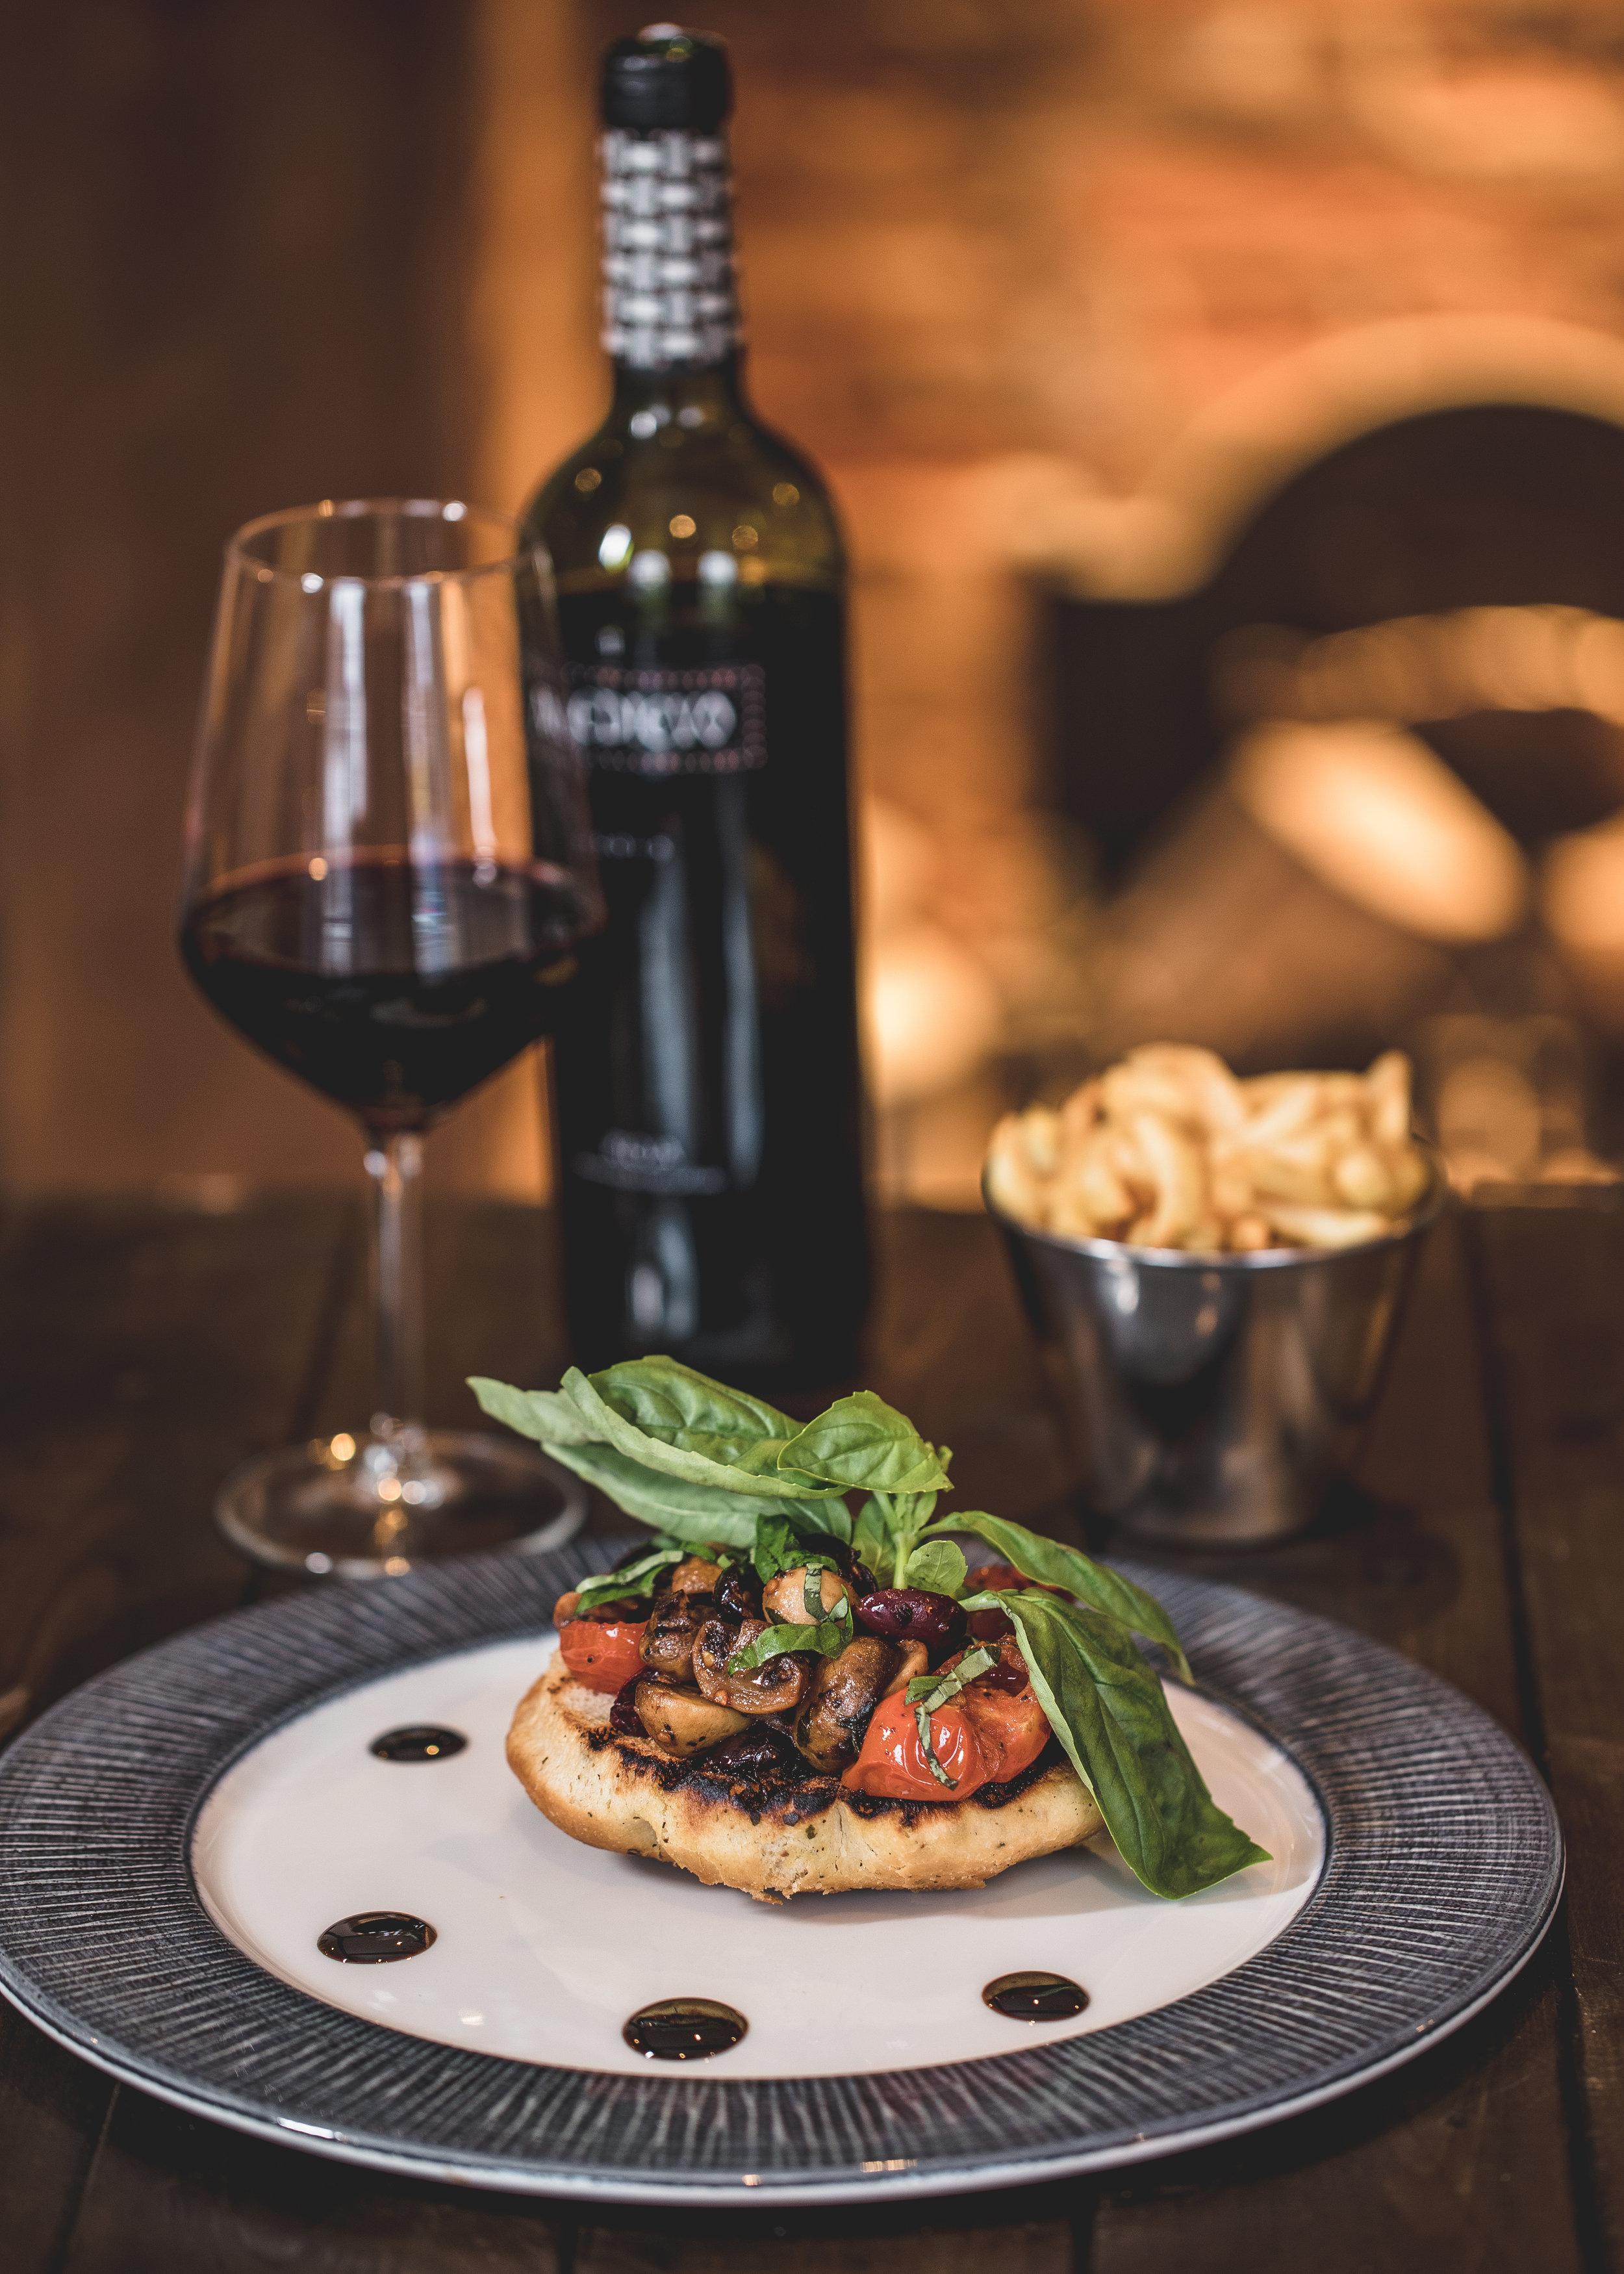 Restaurants - Beautiful food photography